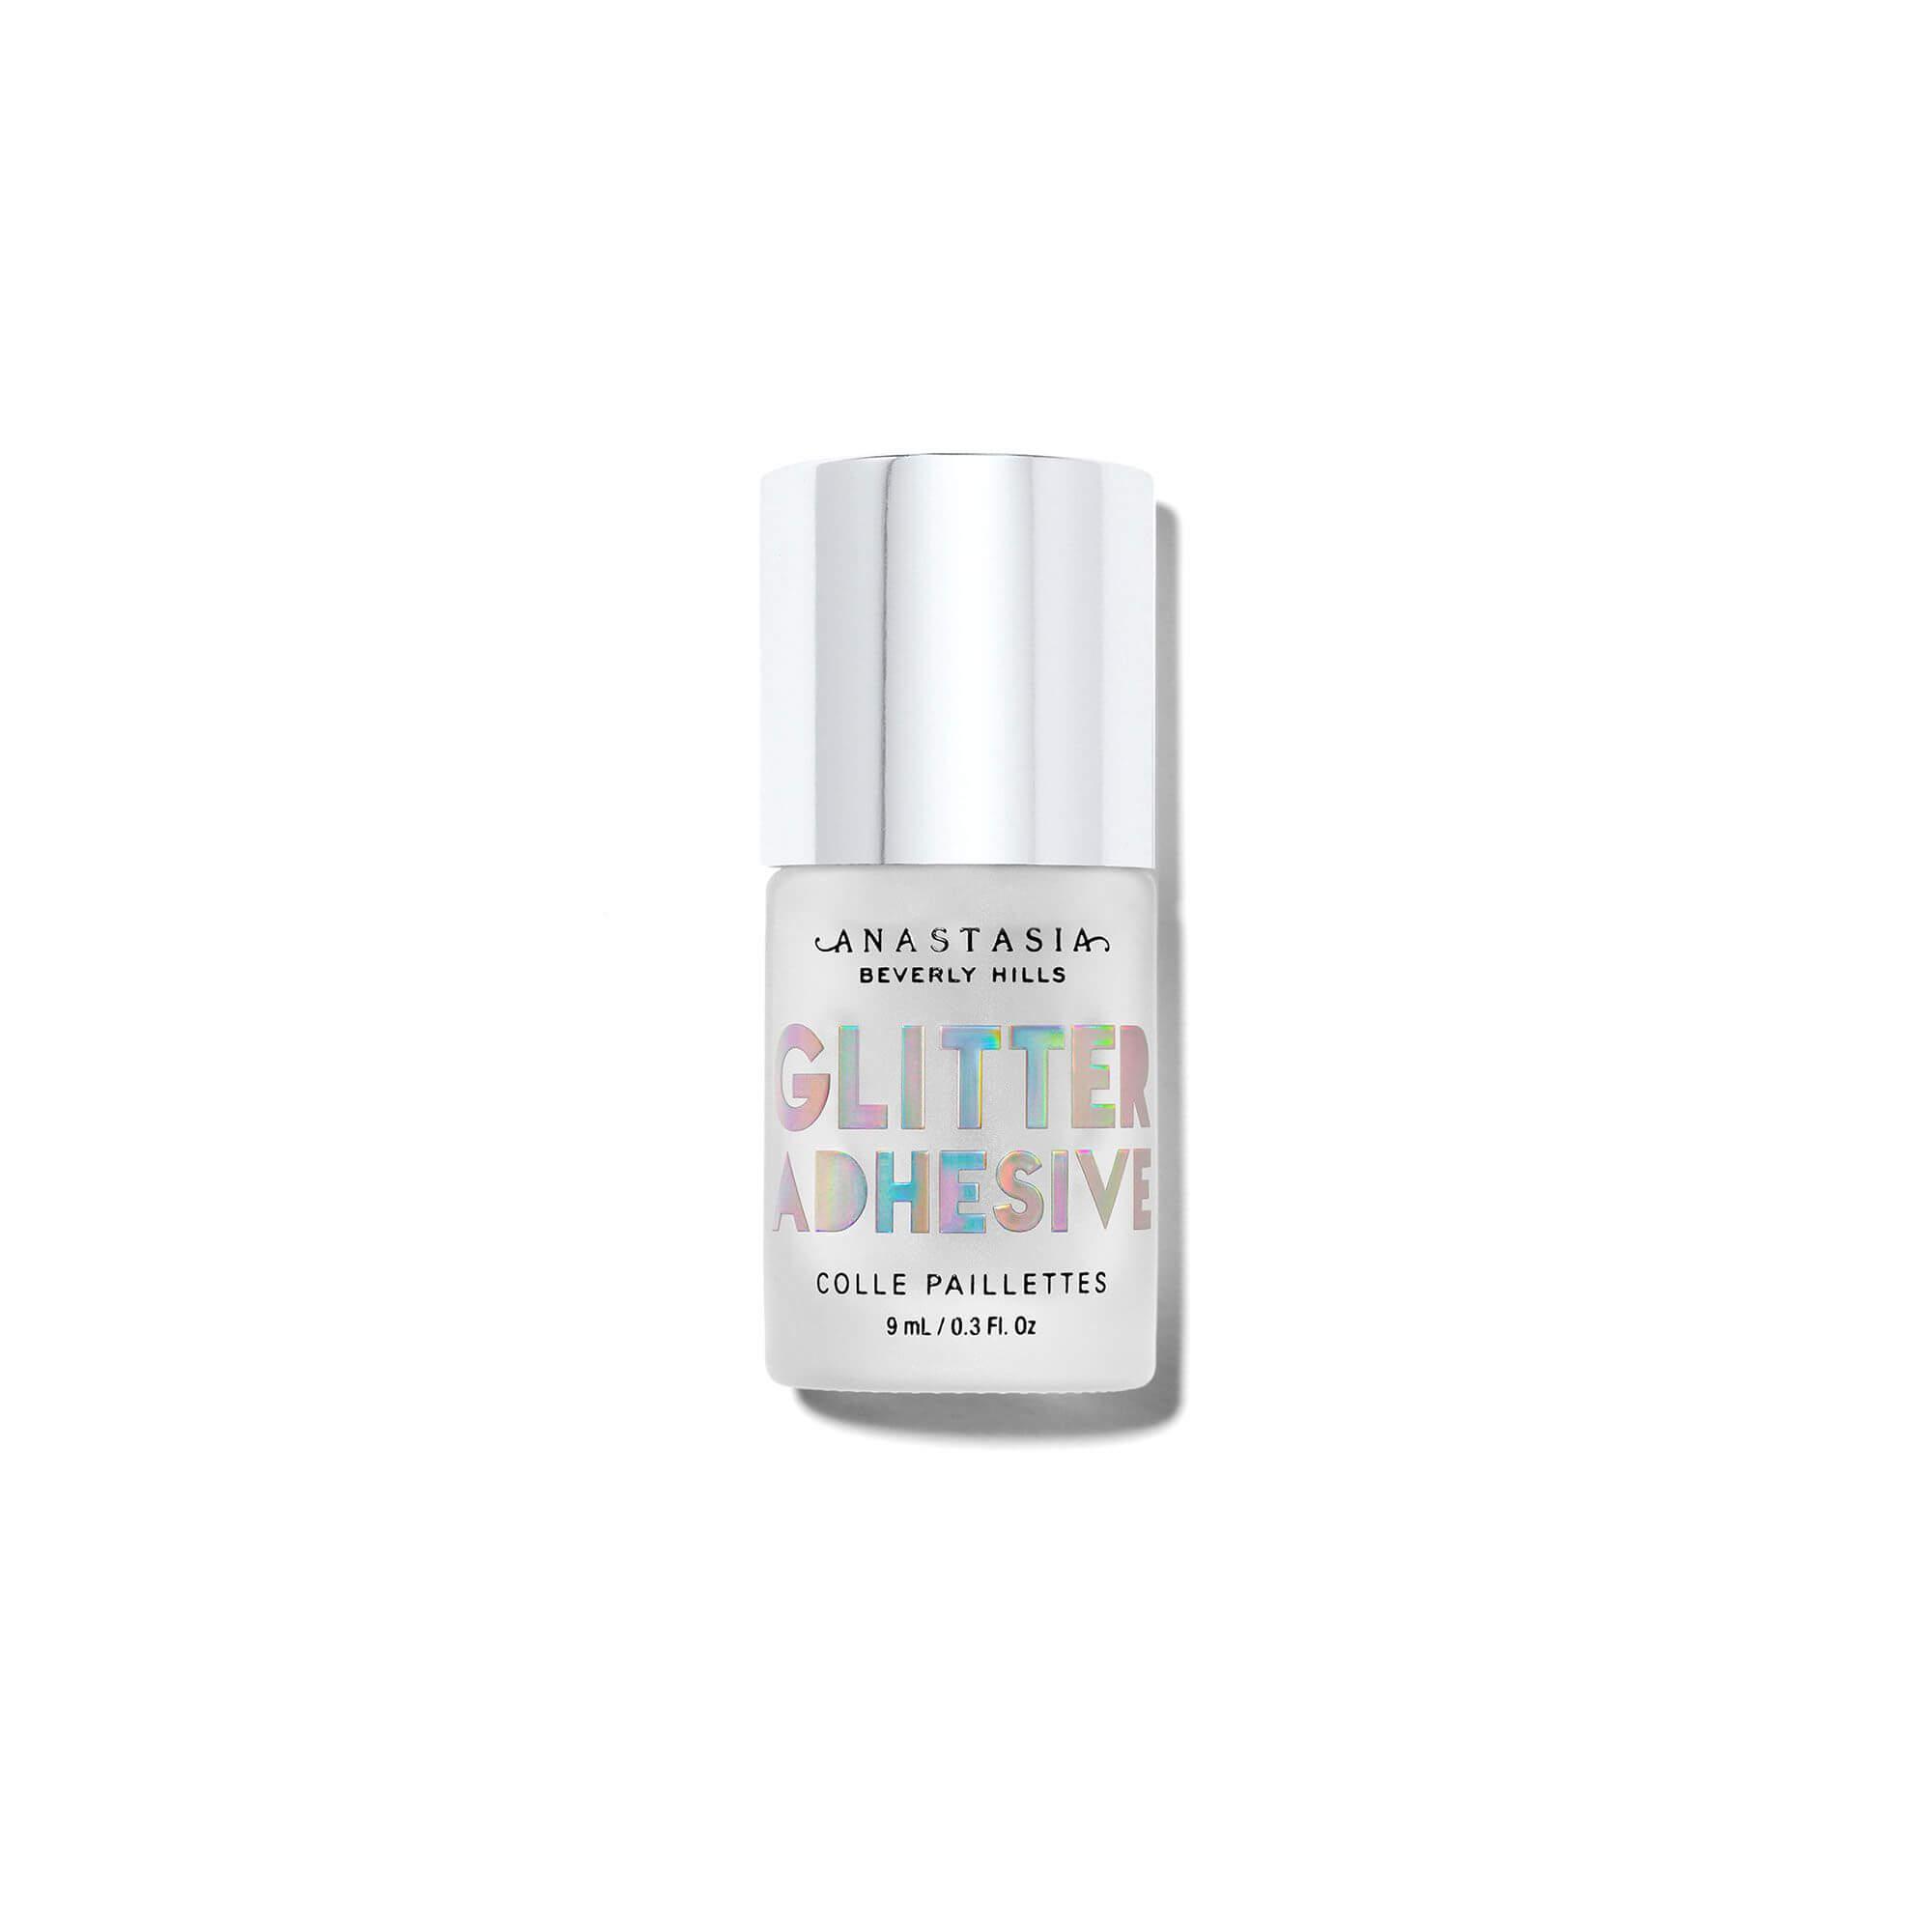 Glitter Adhesive Abh Cosmetic